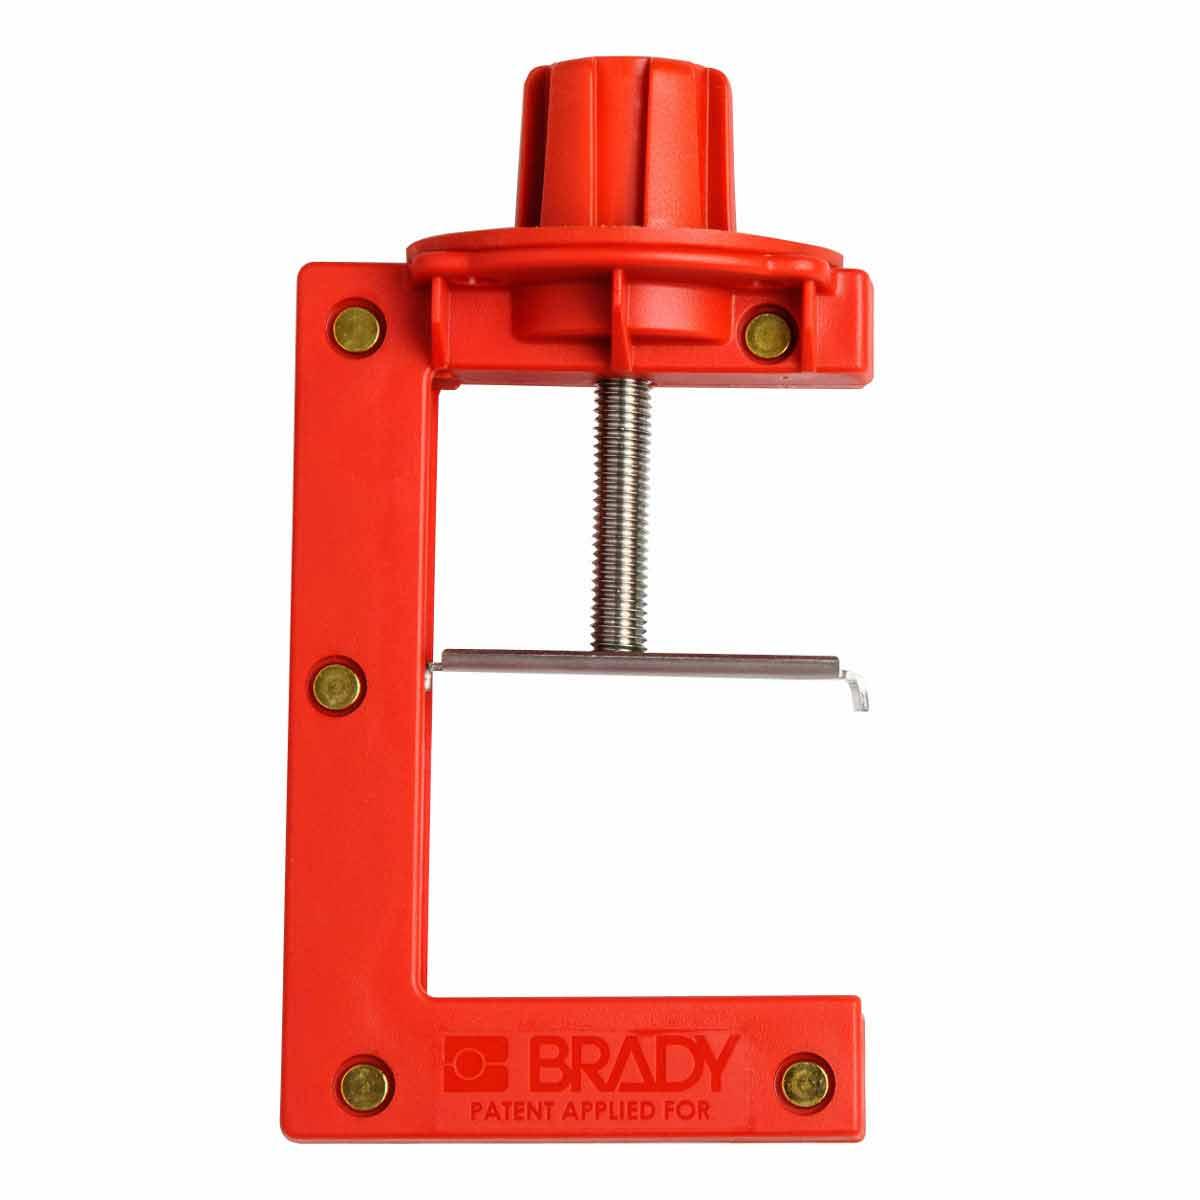 Brady® 121505 Large Butterfly Valve Lockout, Fits Minimum Handle Size: 2 in THK, Fits Maximum Handle Size: 4 in THK, 4 Padlocks, -20 deg F Min, 140 deg F max